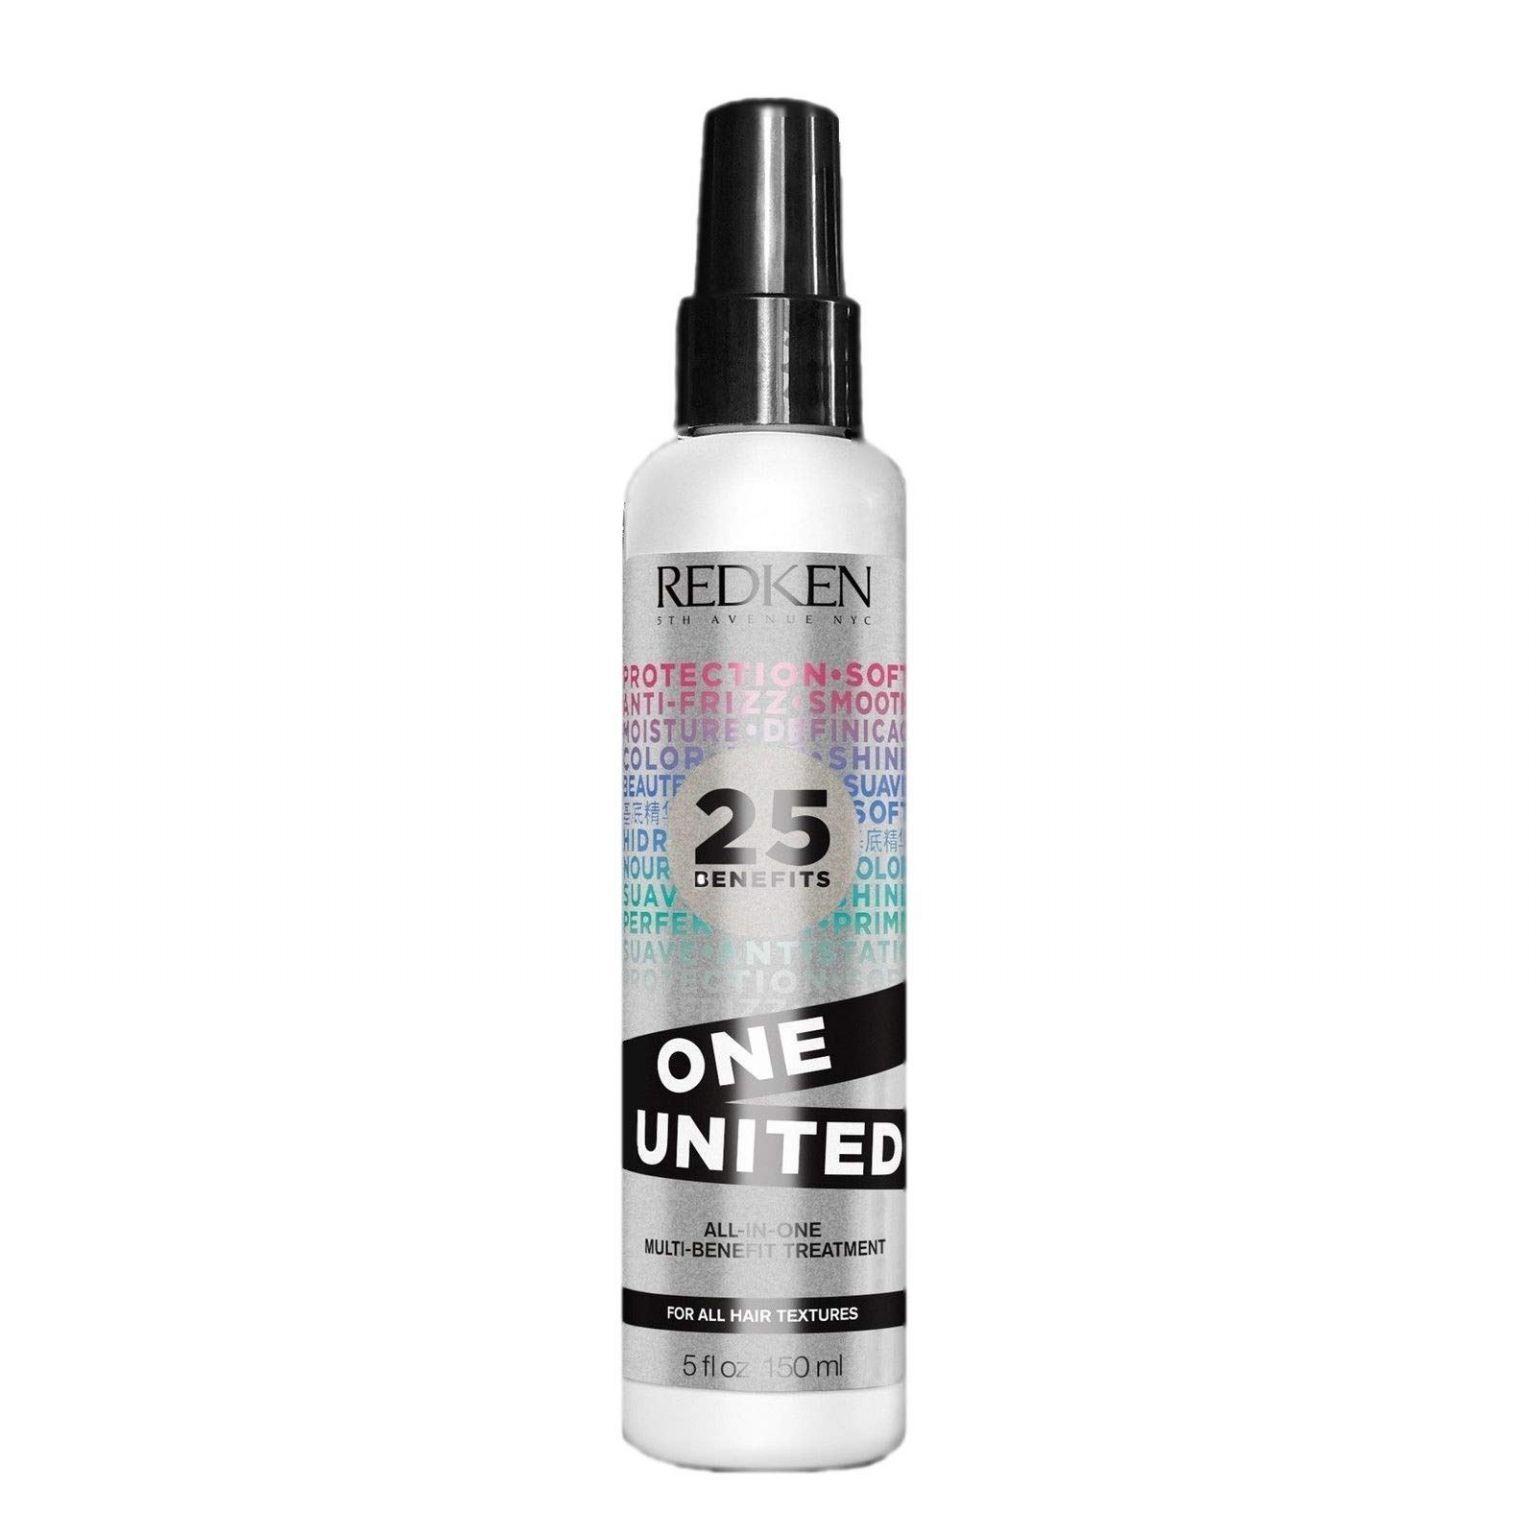 One United Multi Benefit Hair Treatment